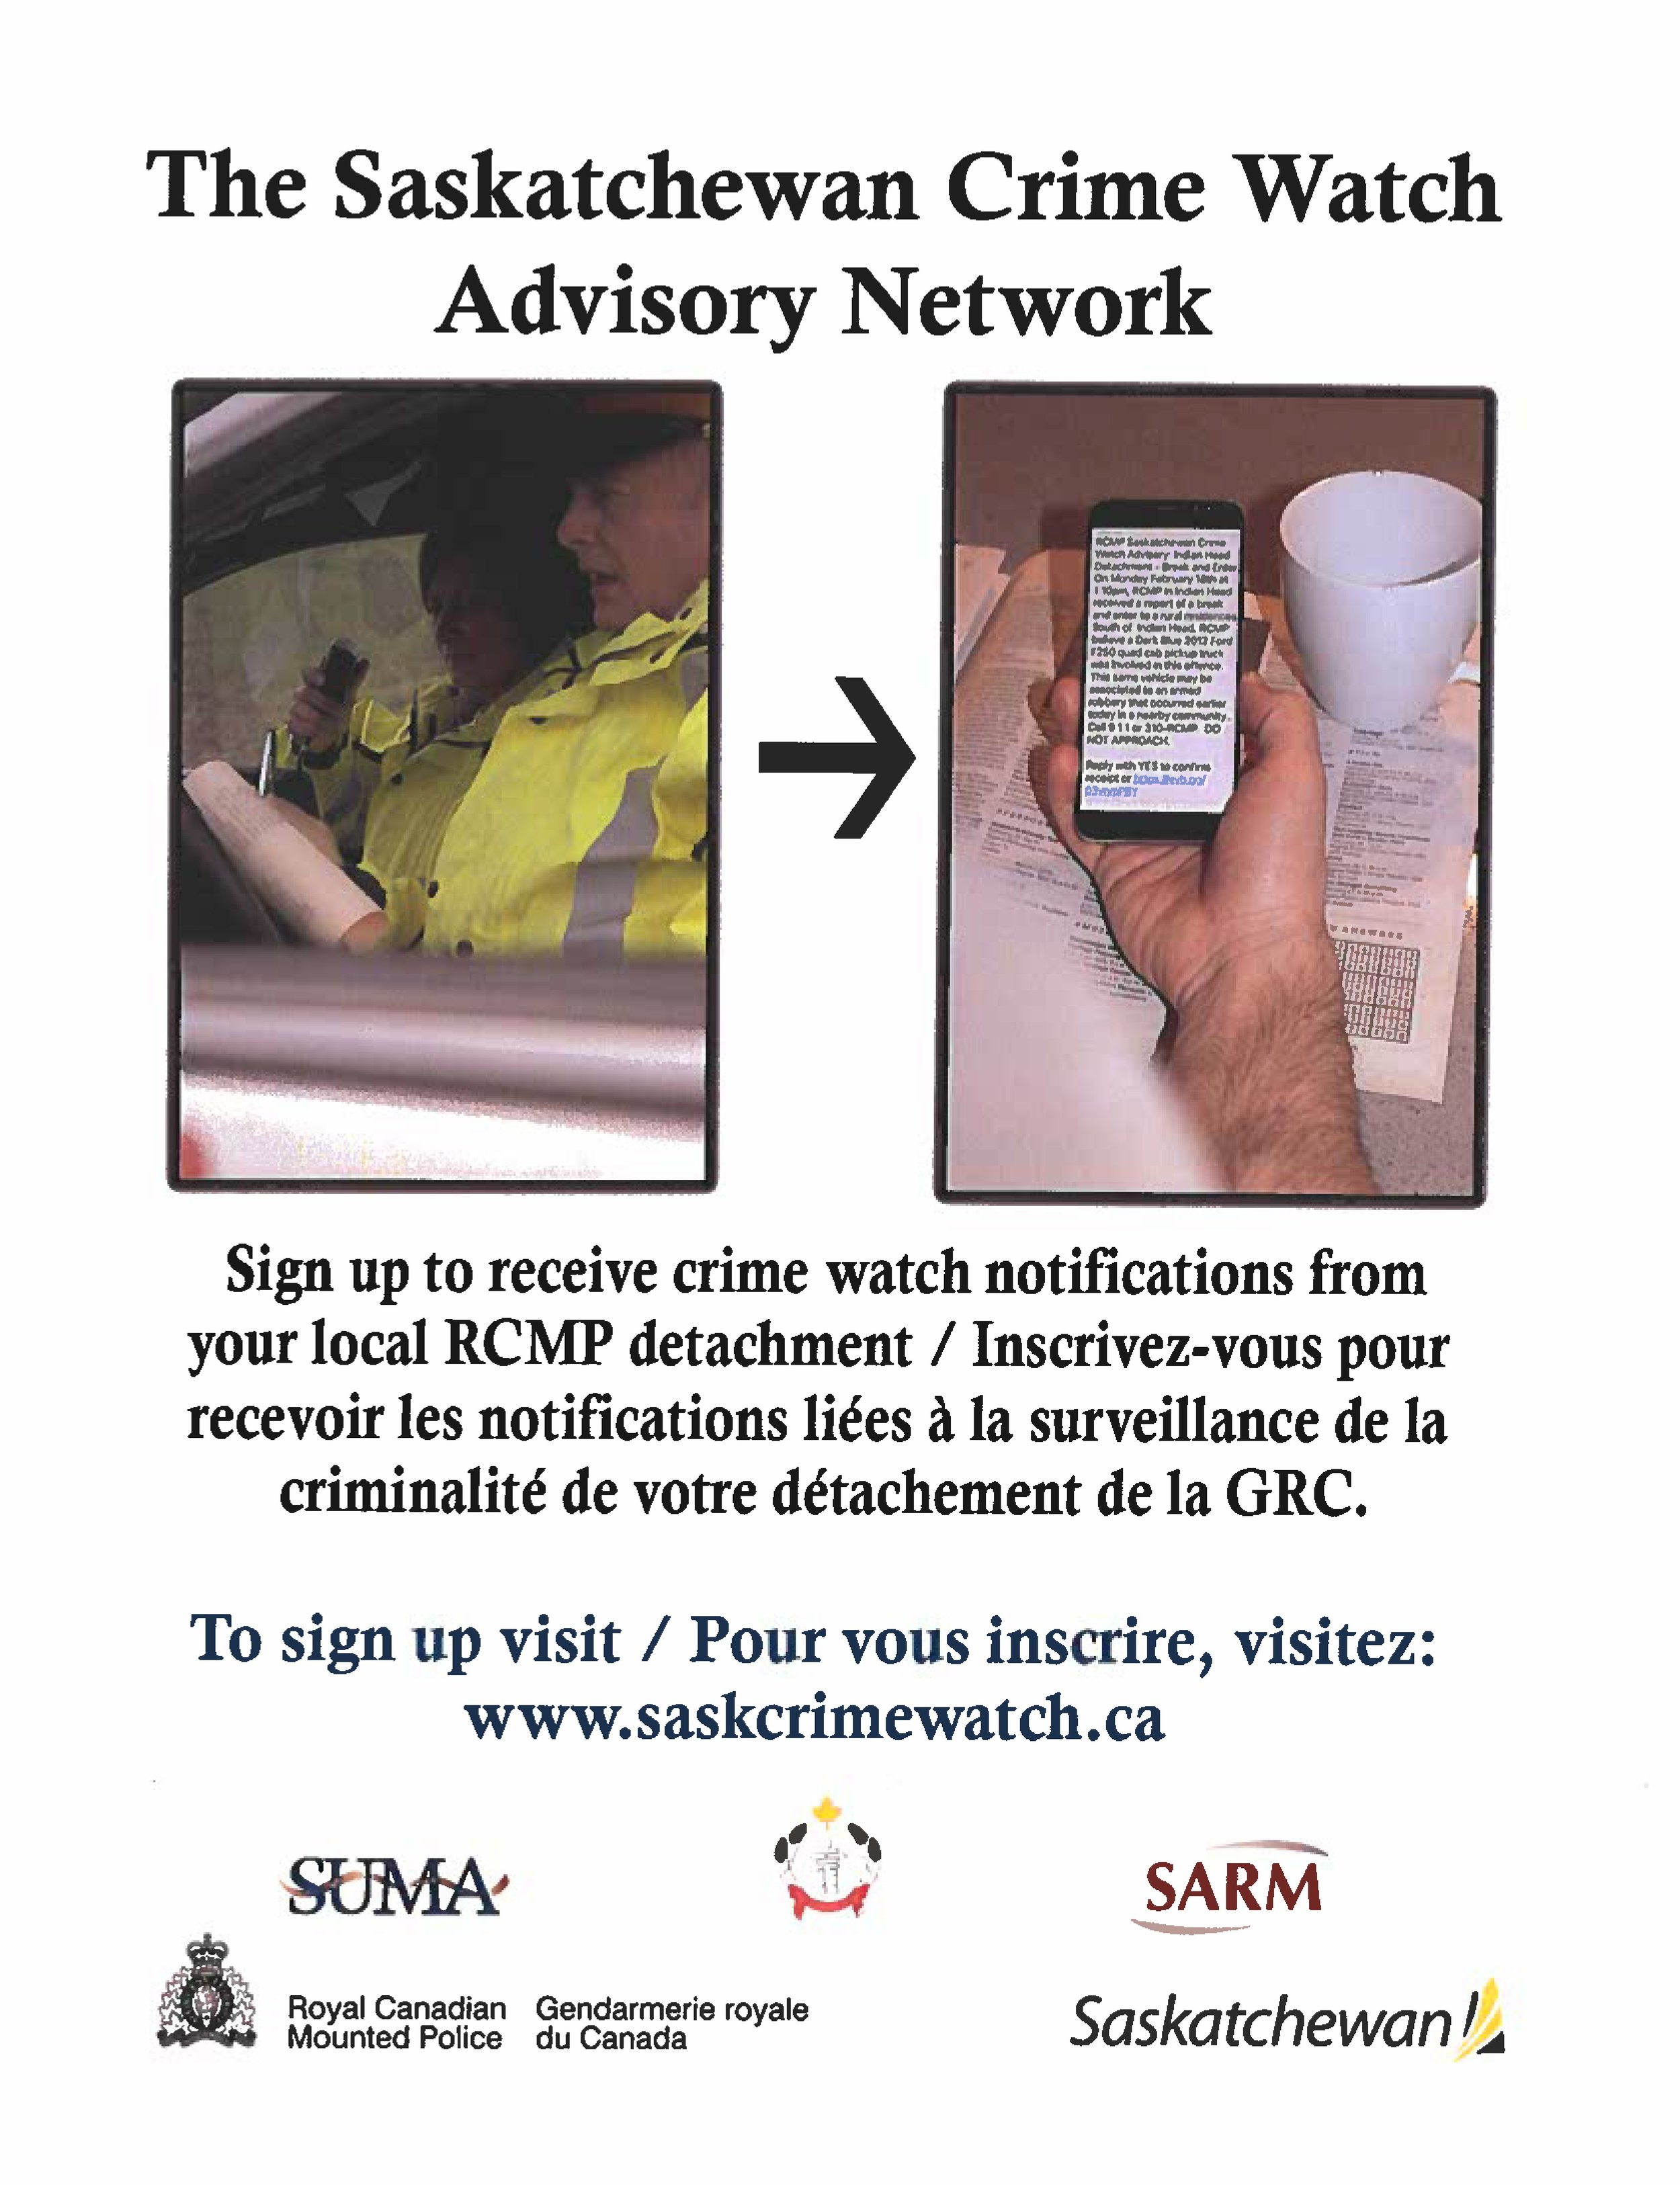 Sask Crime Watch Advisory Network Poster.jpg